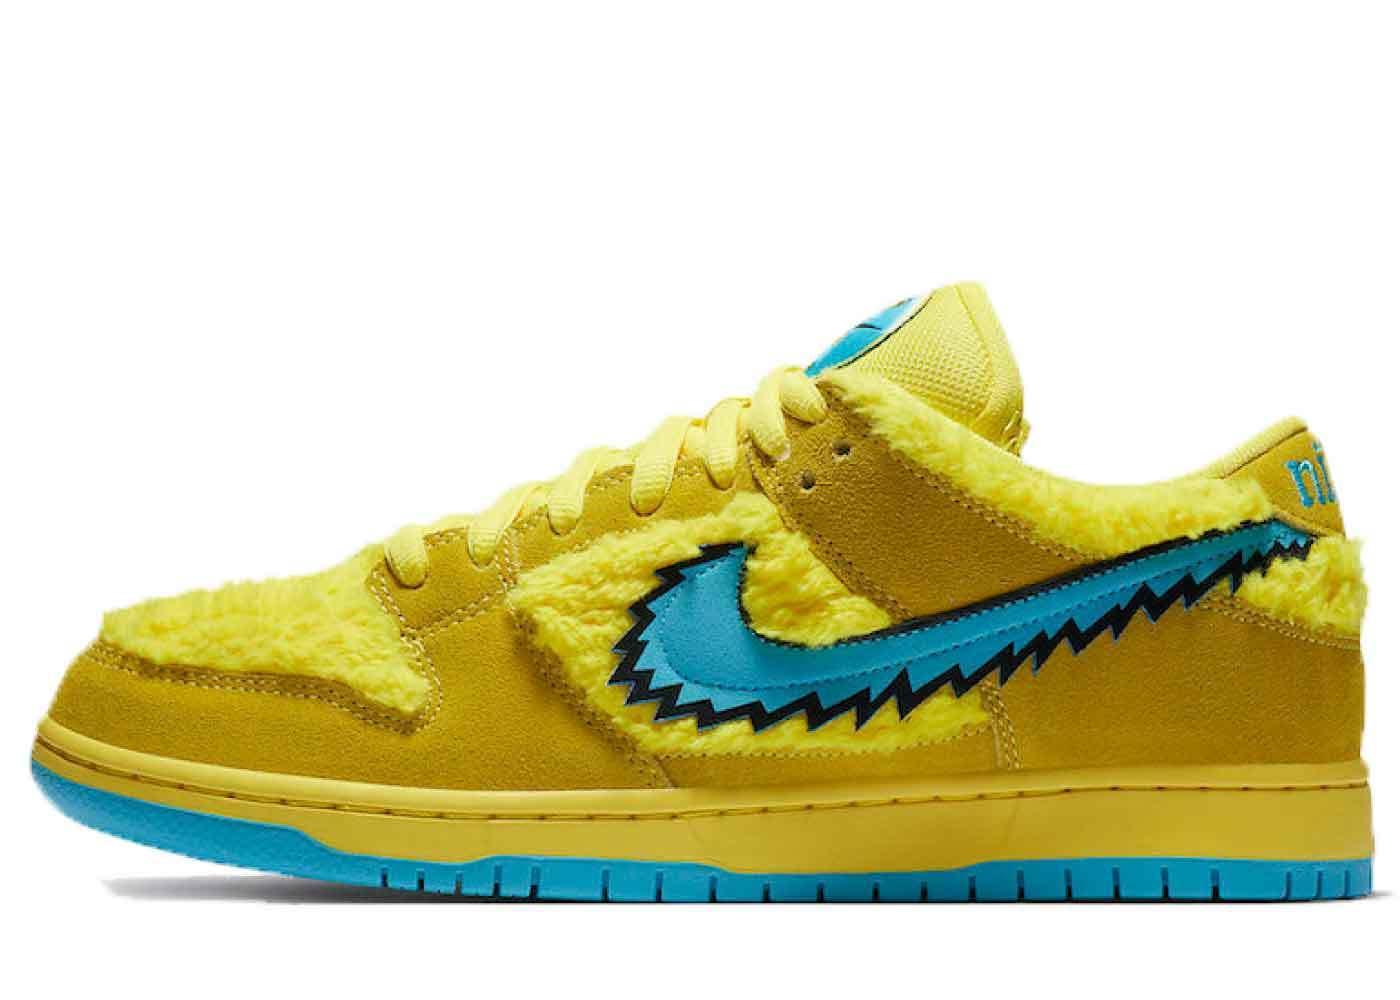 Grateful Dead x Nike SB Dunk Low Yellow Bearの写真